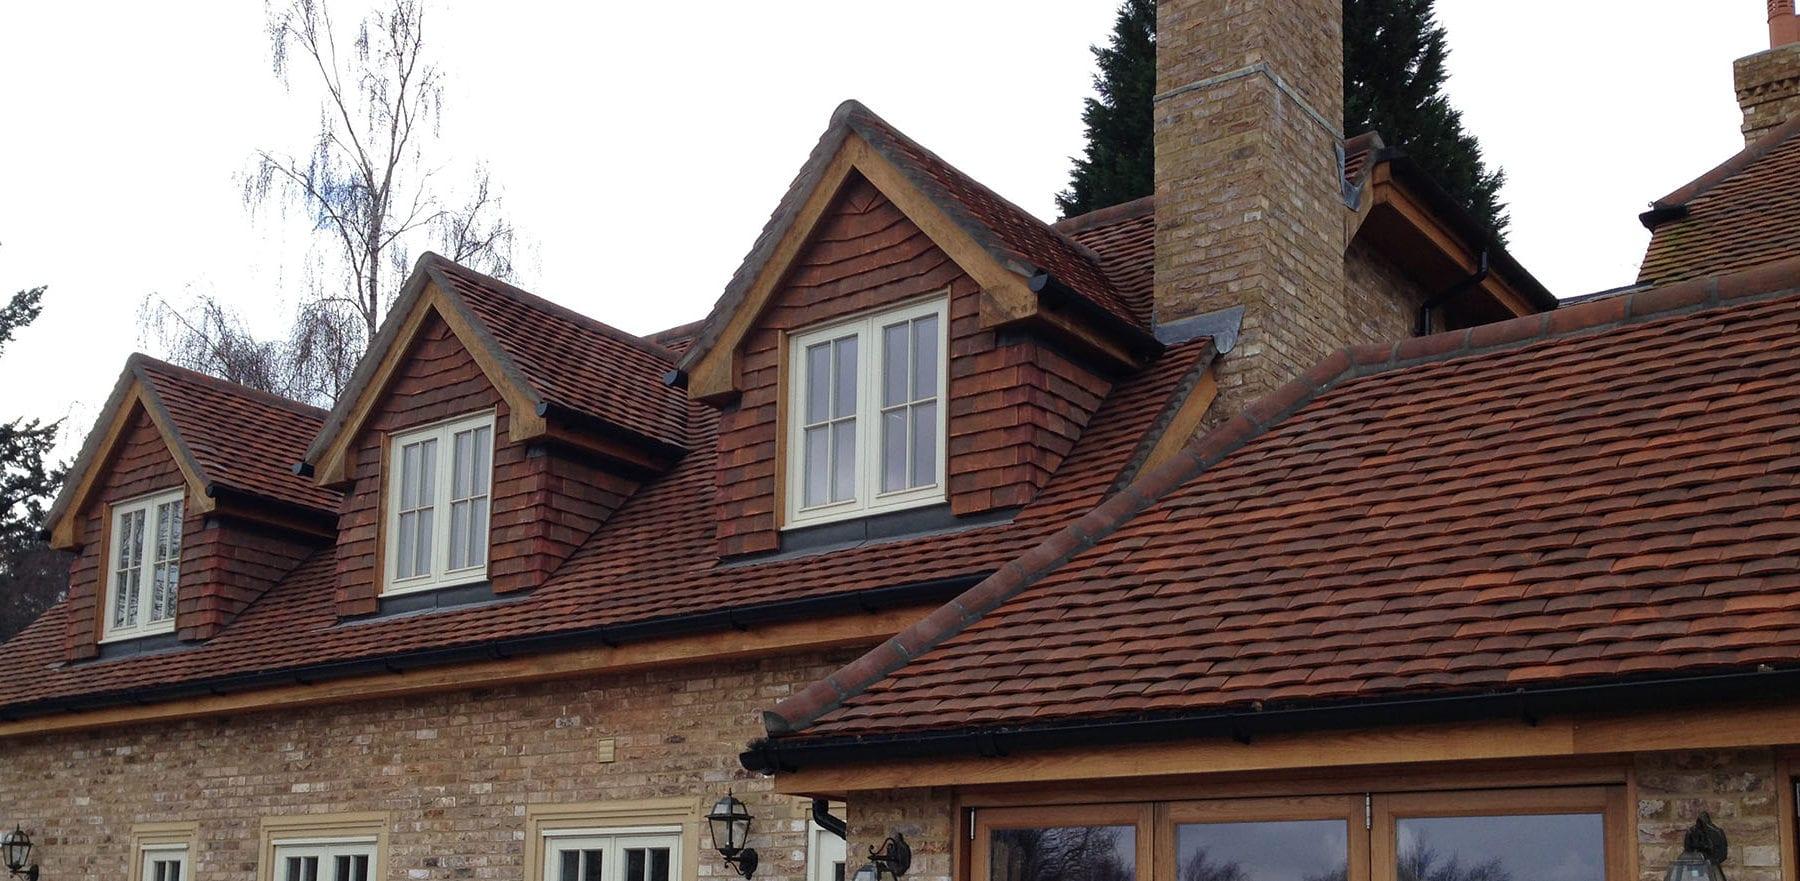 Lifestiles - Handmade Brown Clay Roof Tiles - Sunningdale, England 2